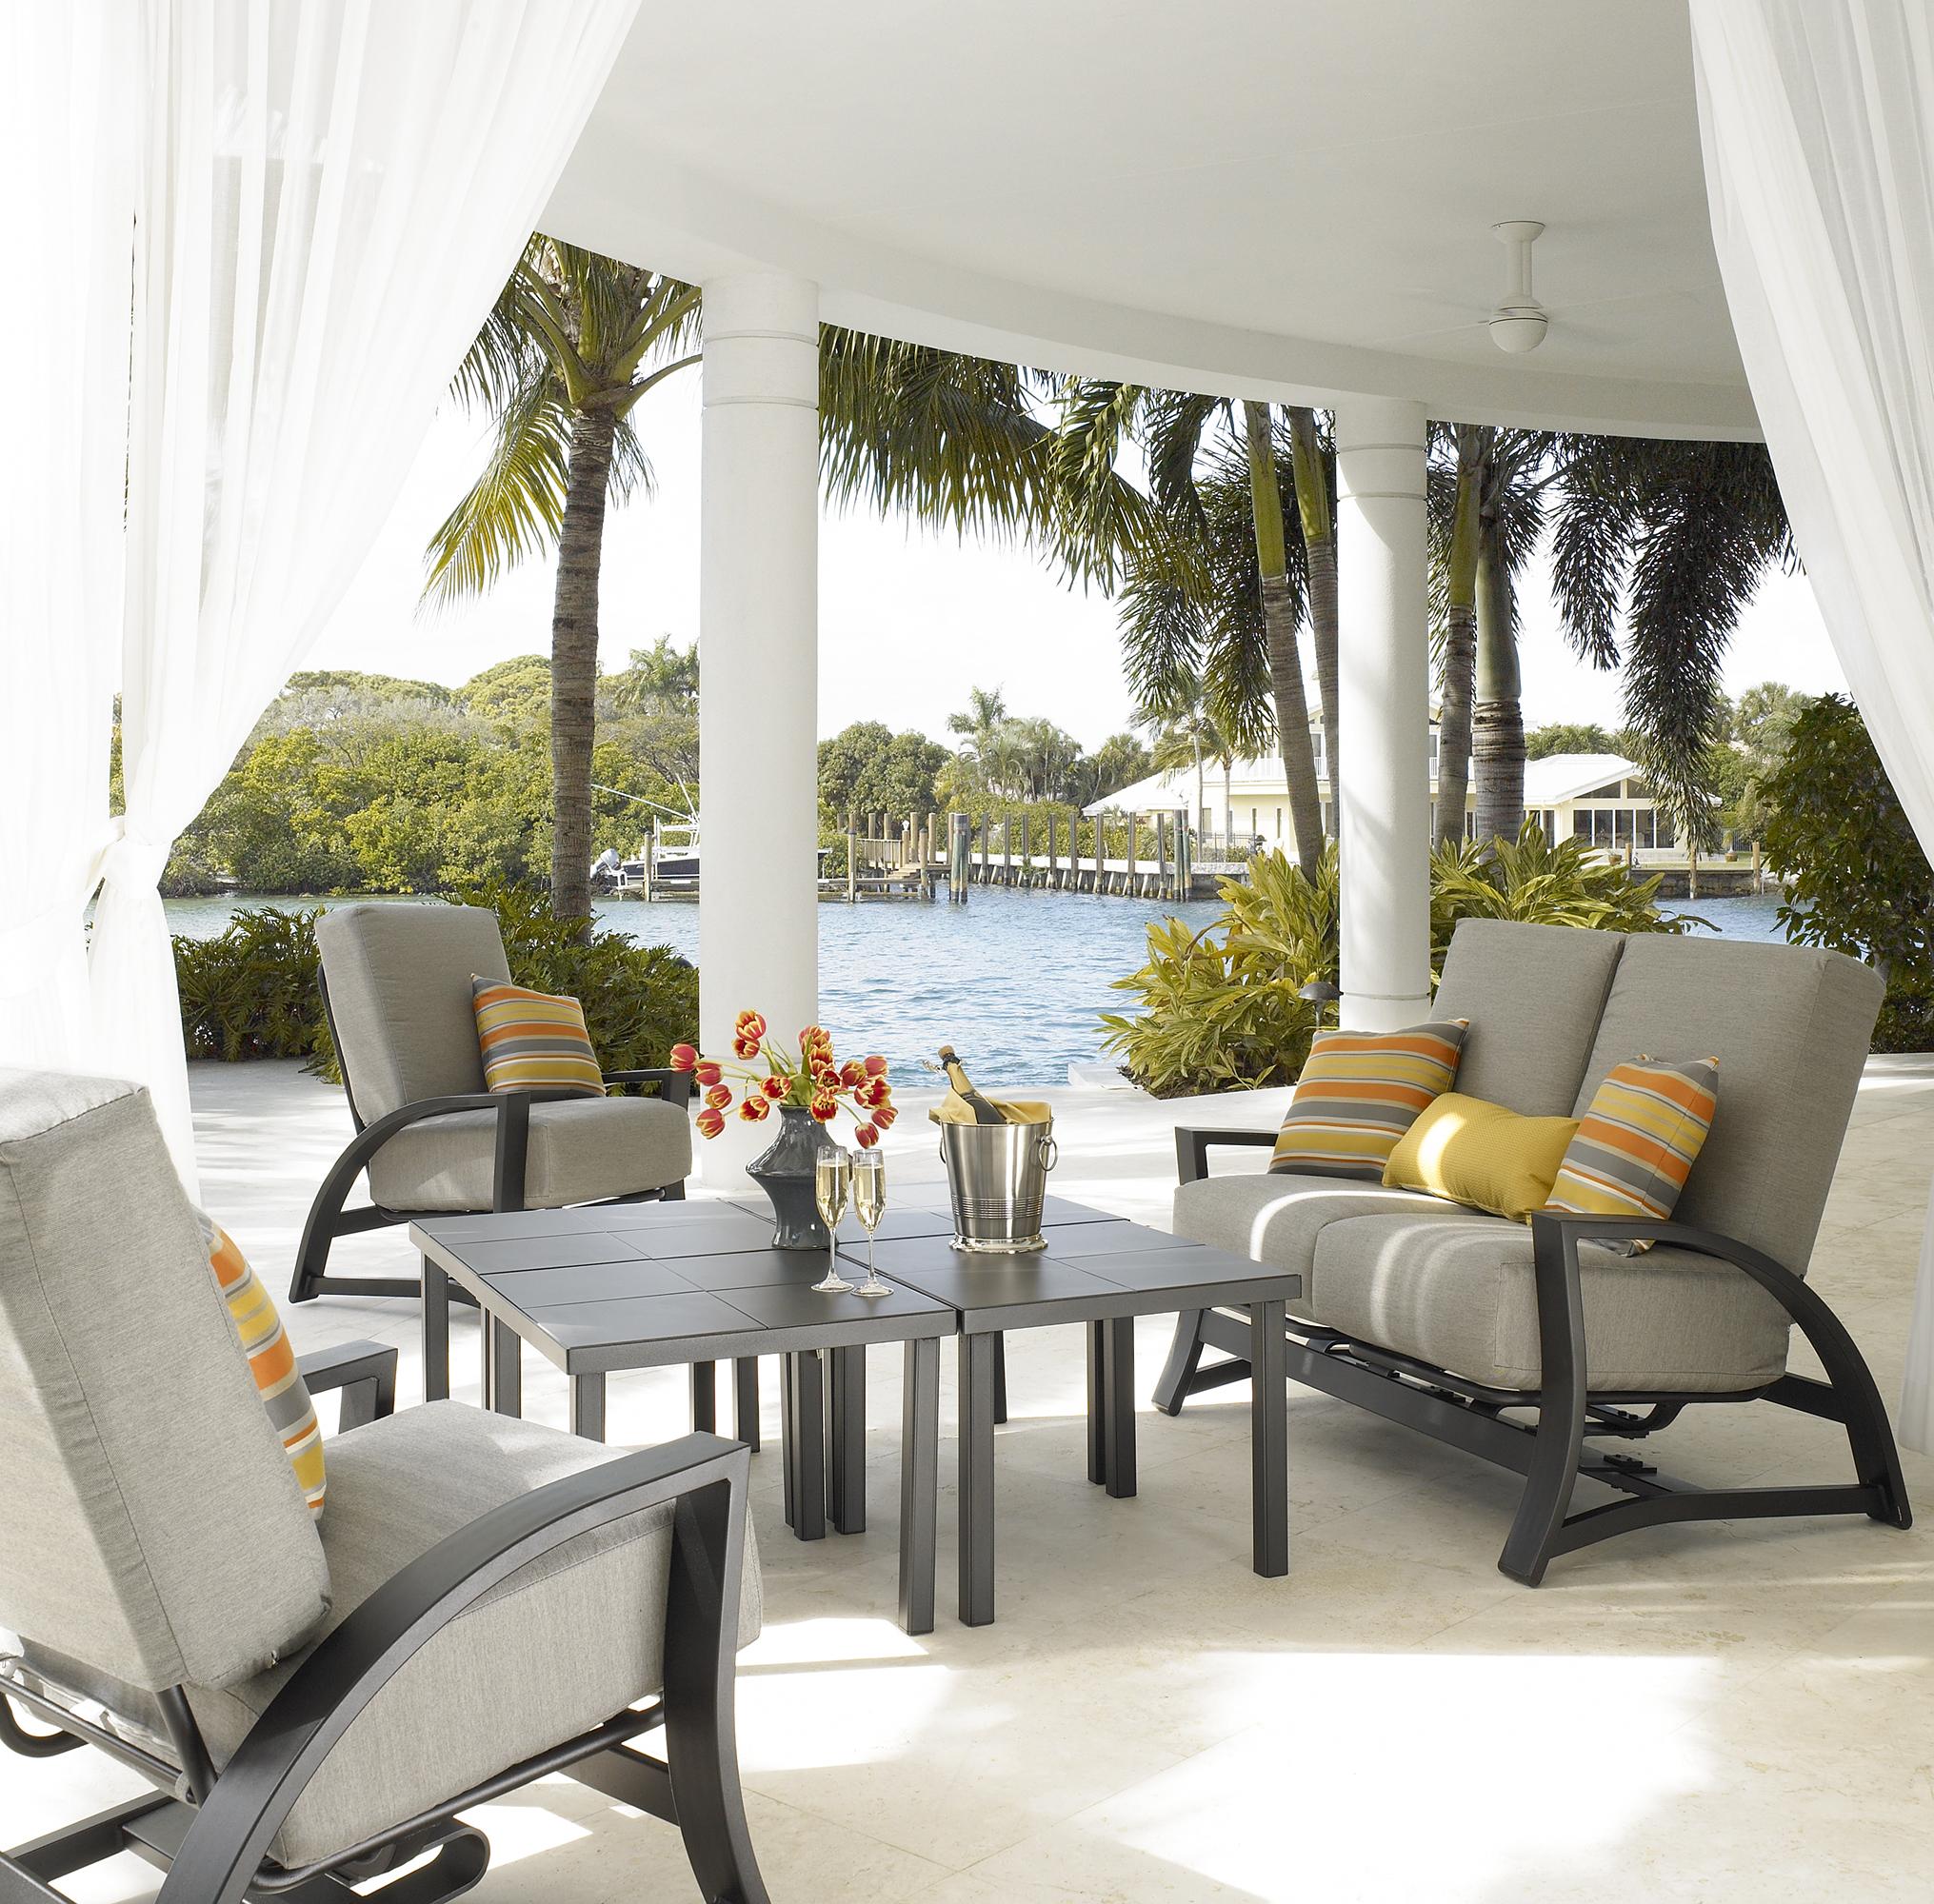 Outdoor furniture in Florida